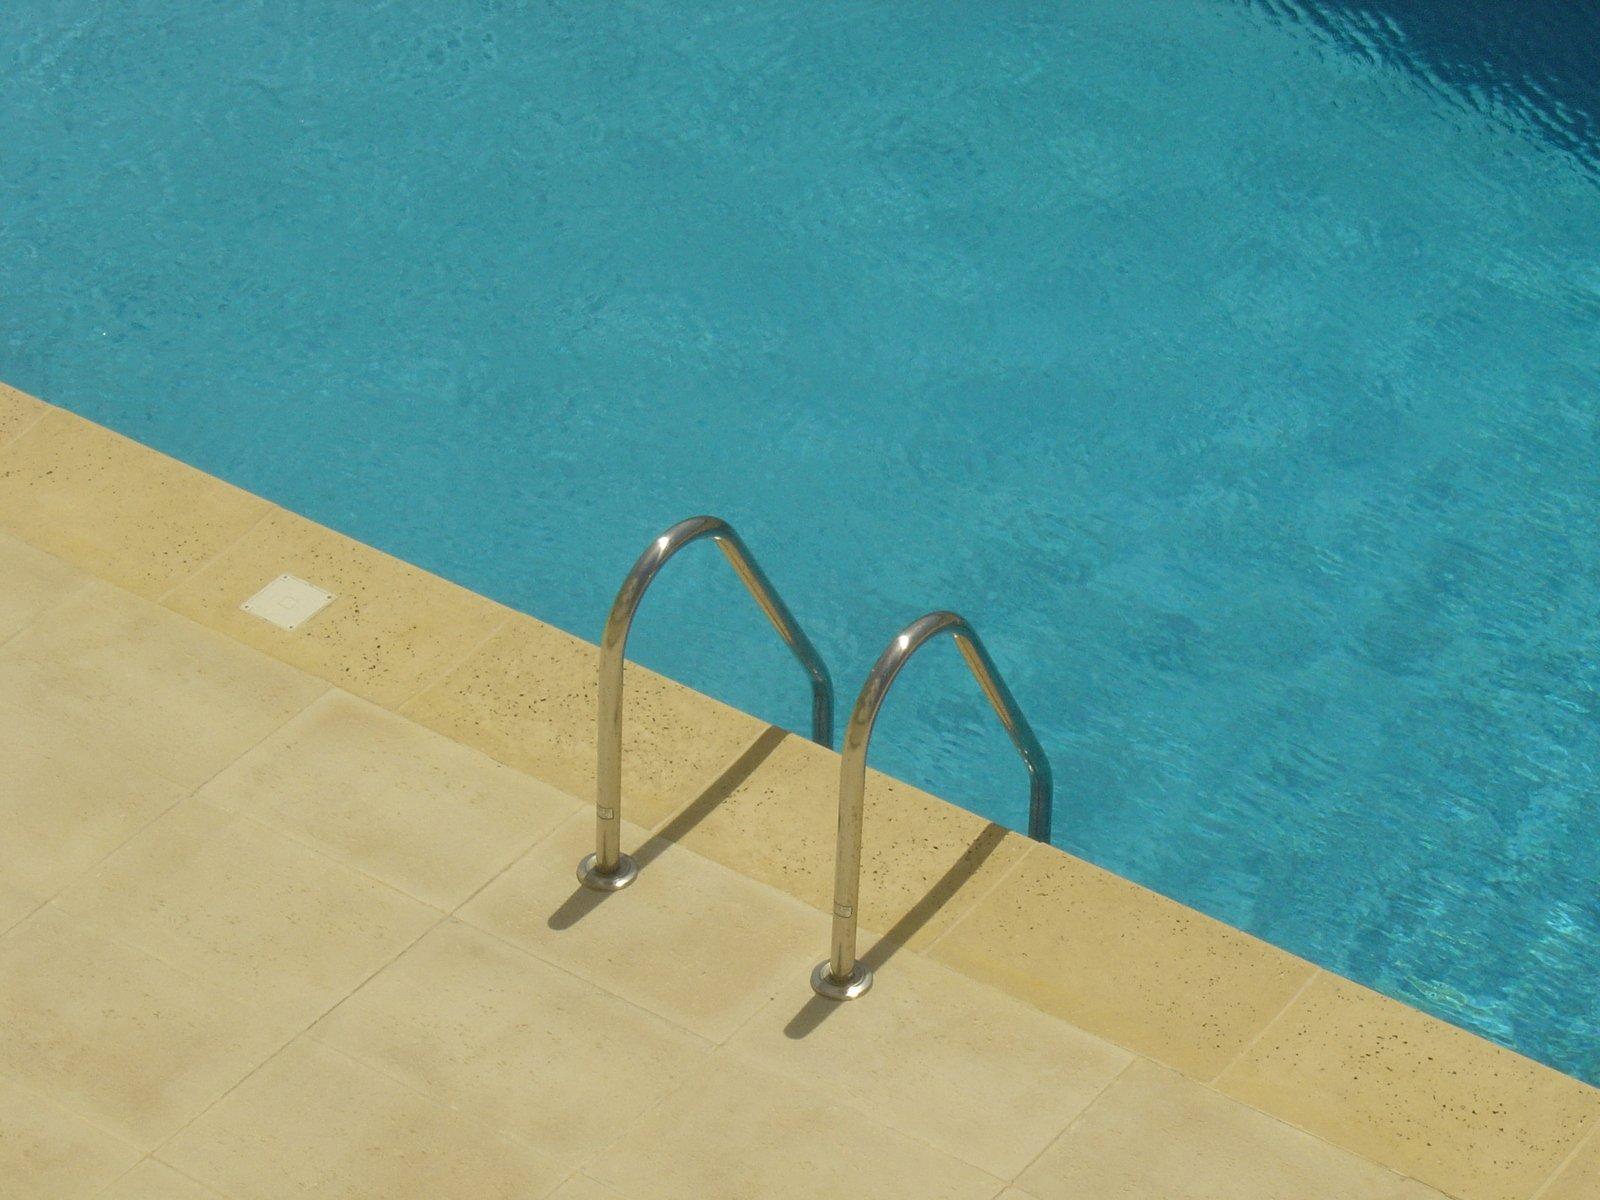 bazén a zábradlie